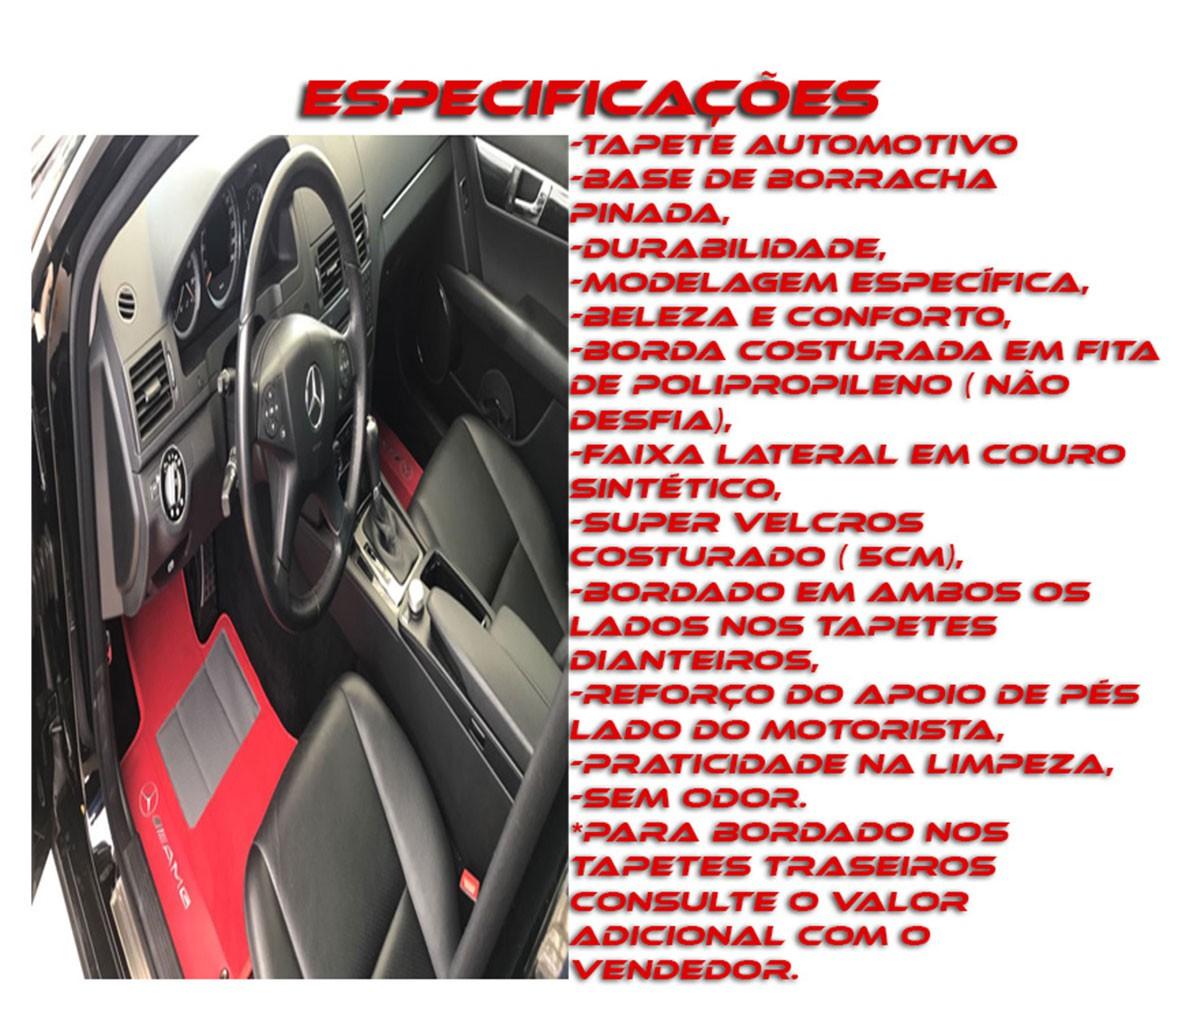 Tapete Audi A6 Carpete Premium  Base Pinada